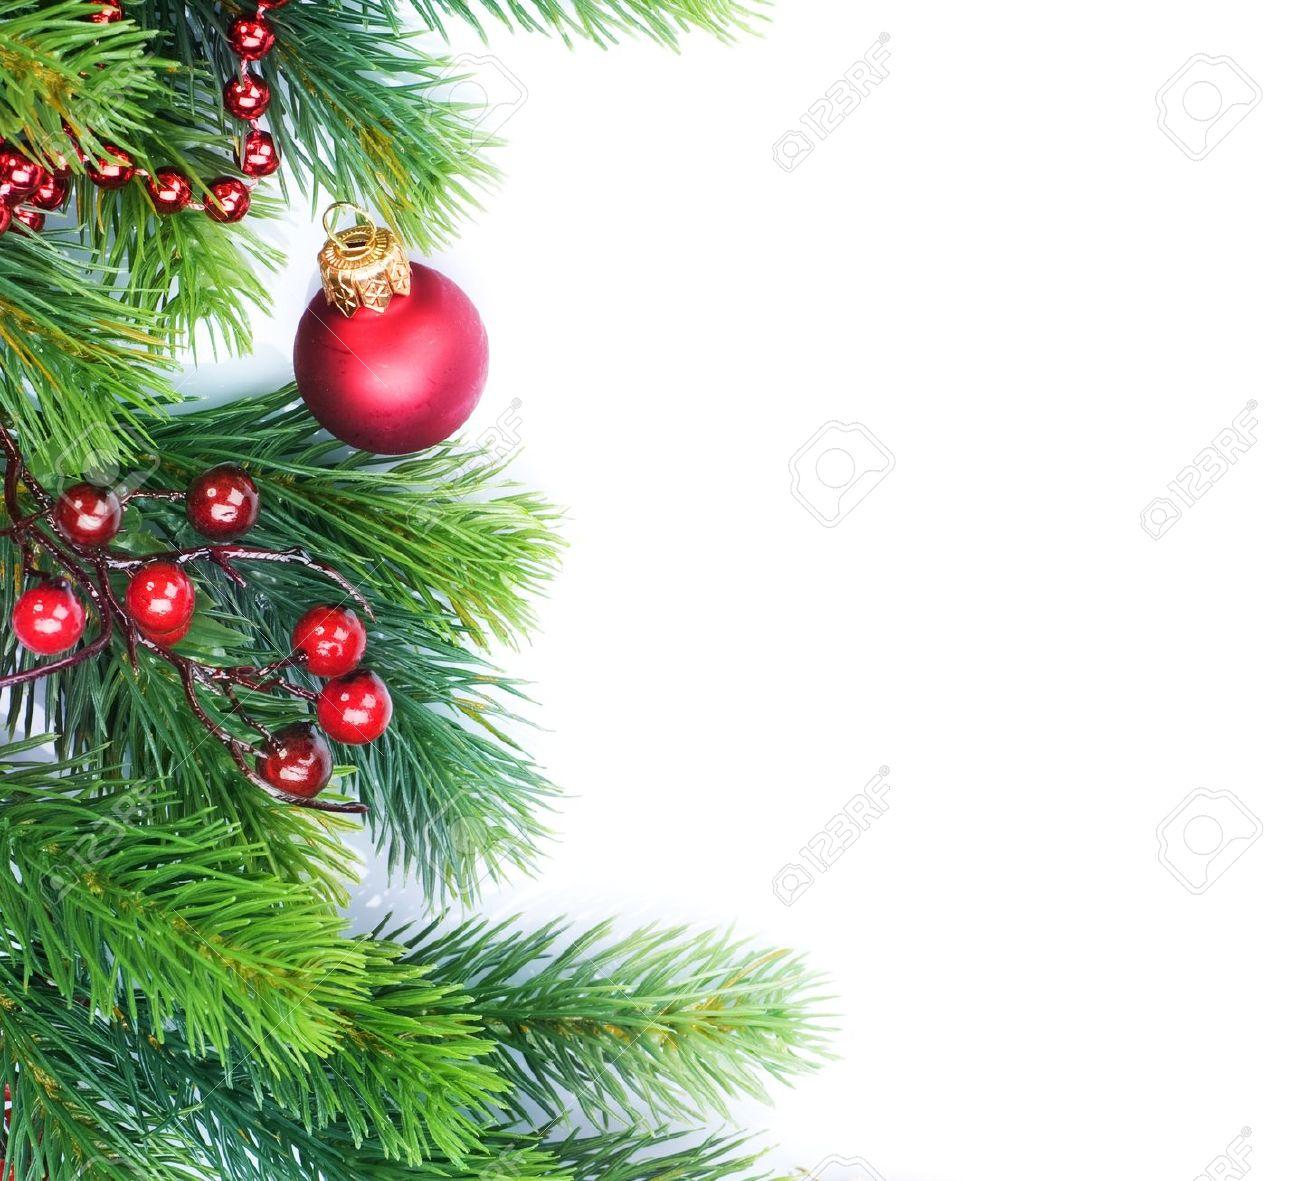 Christmas Border Decorations Over White Stock Photo